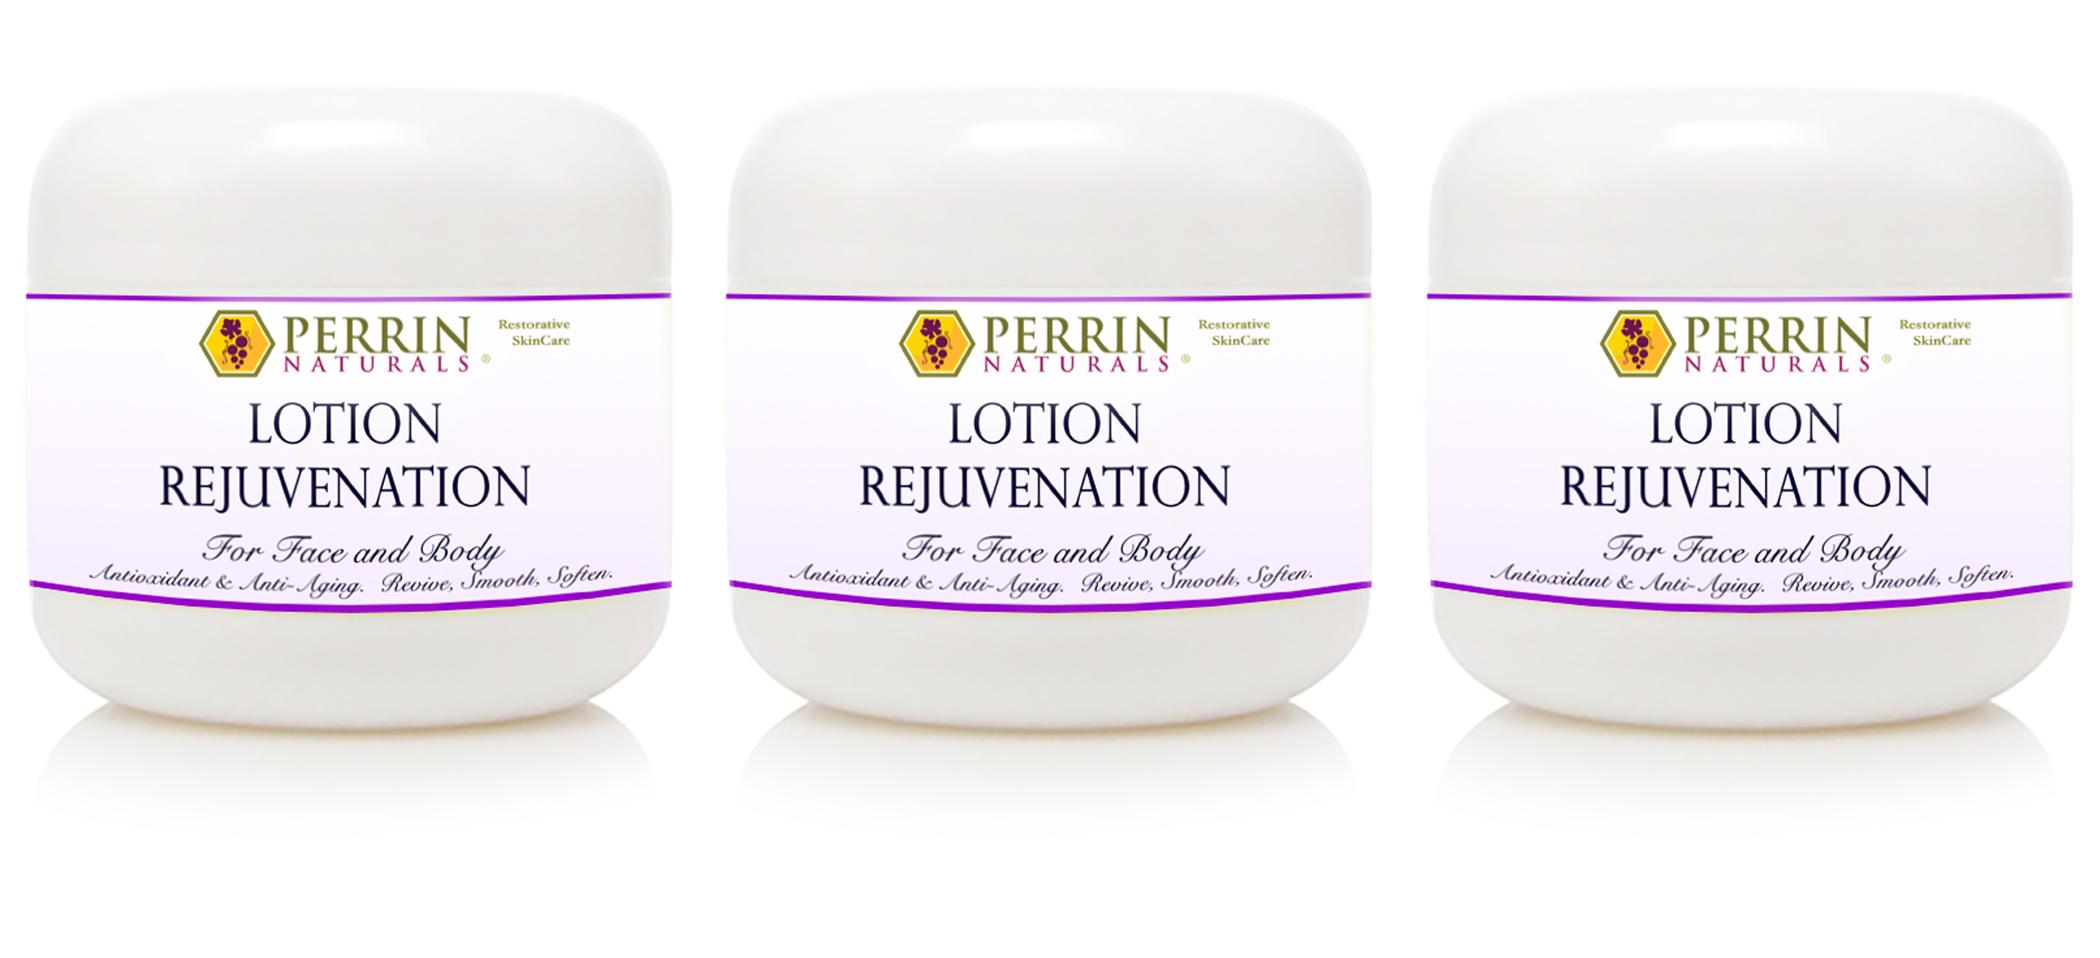 Three Perrin Naturals Lotion Jars